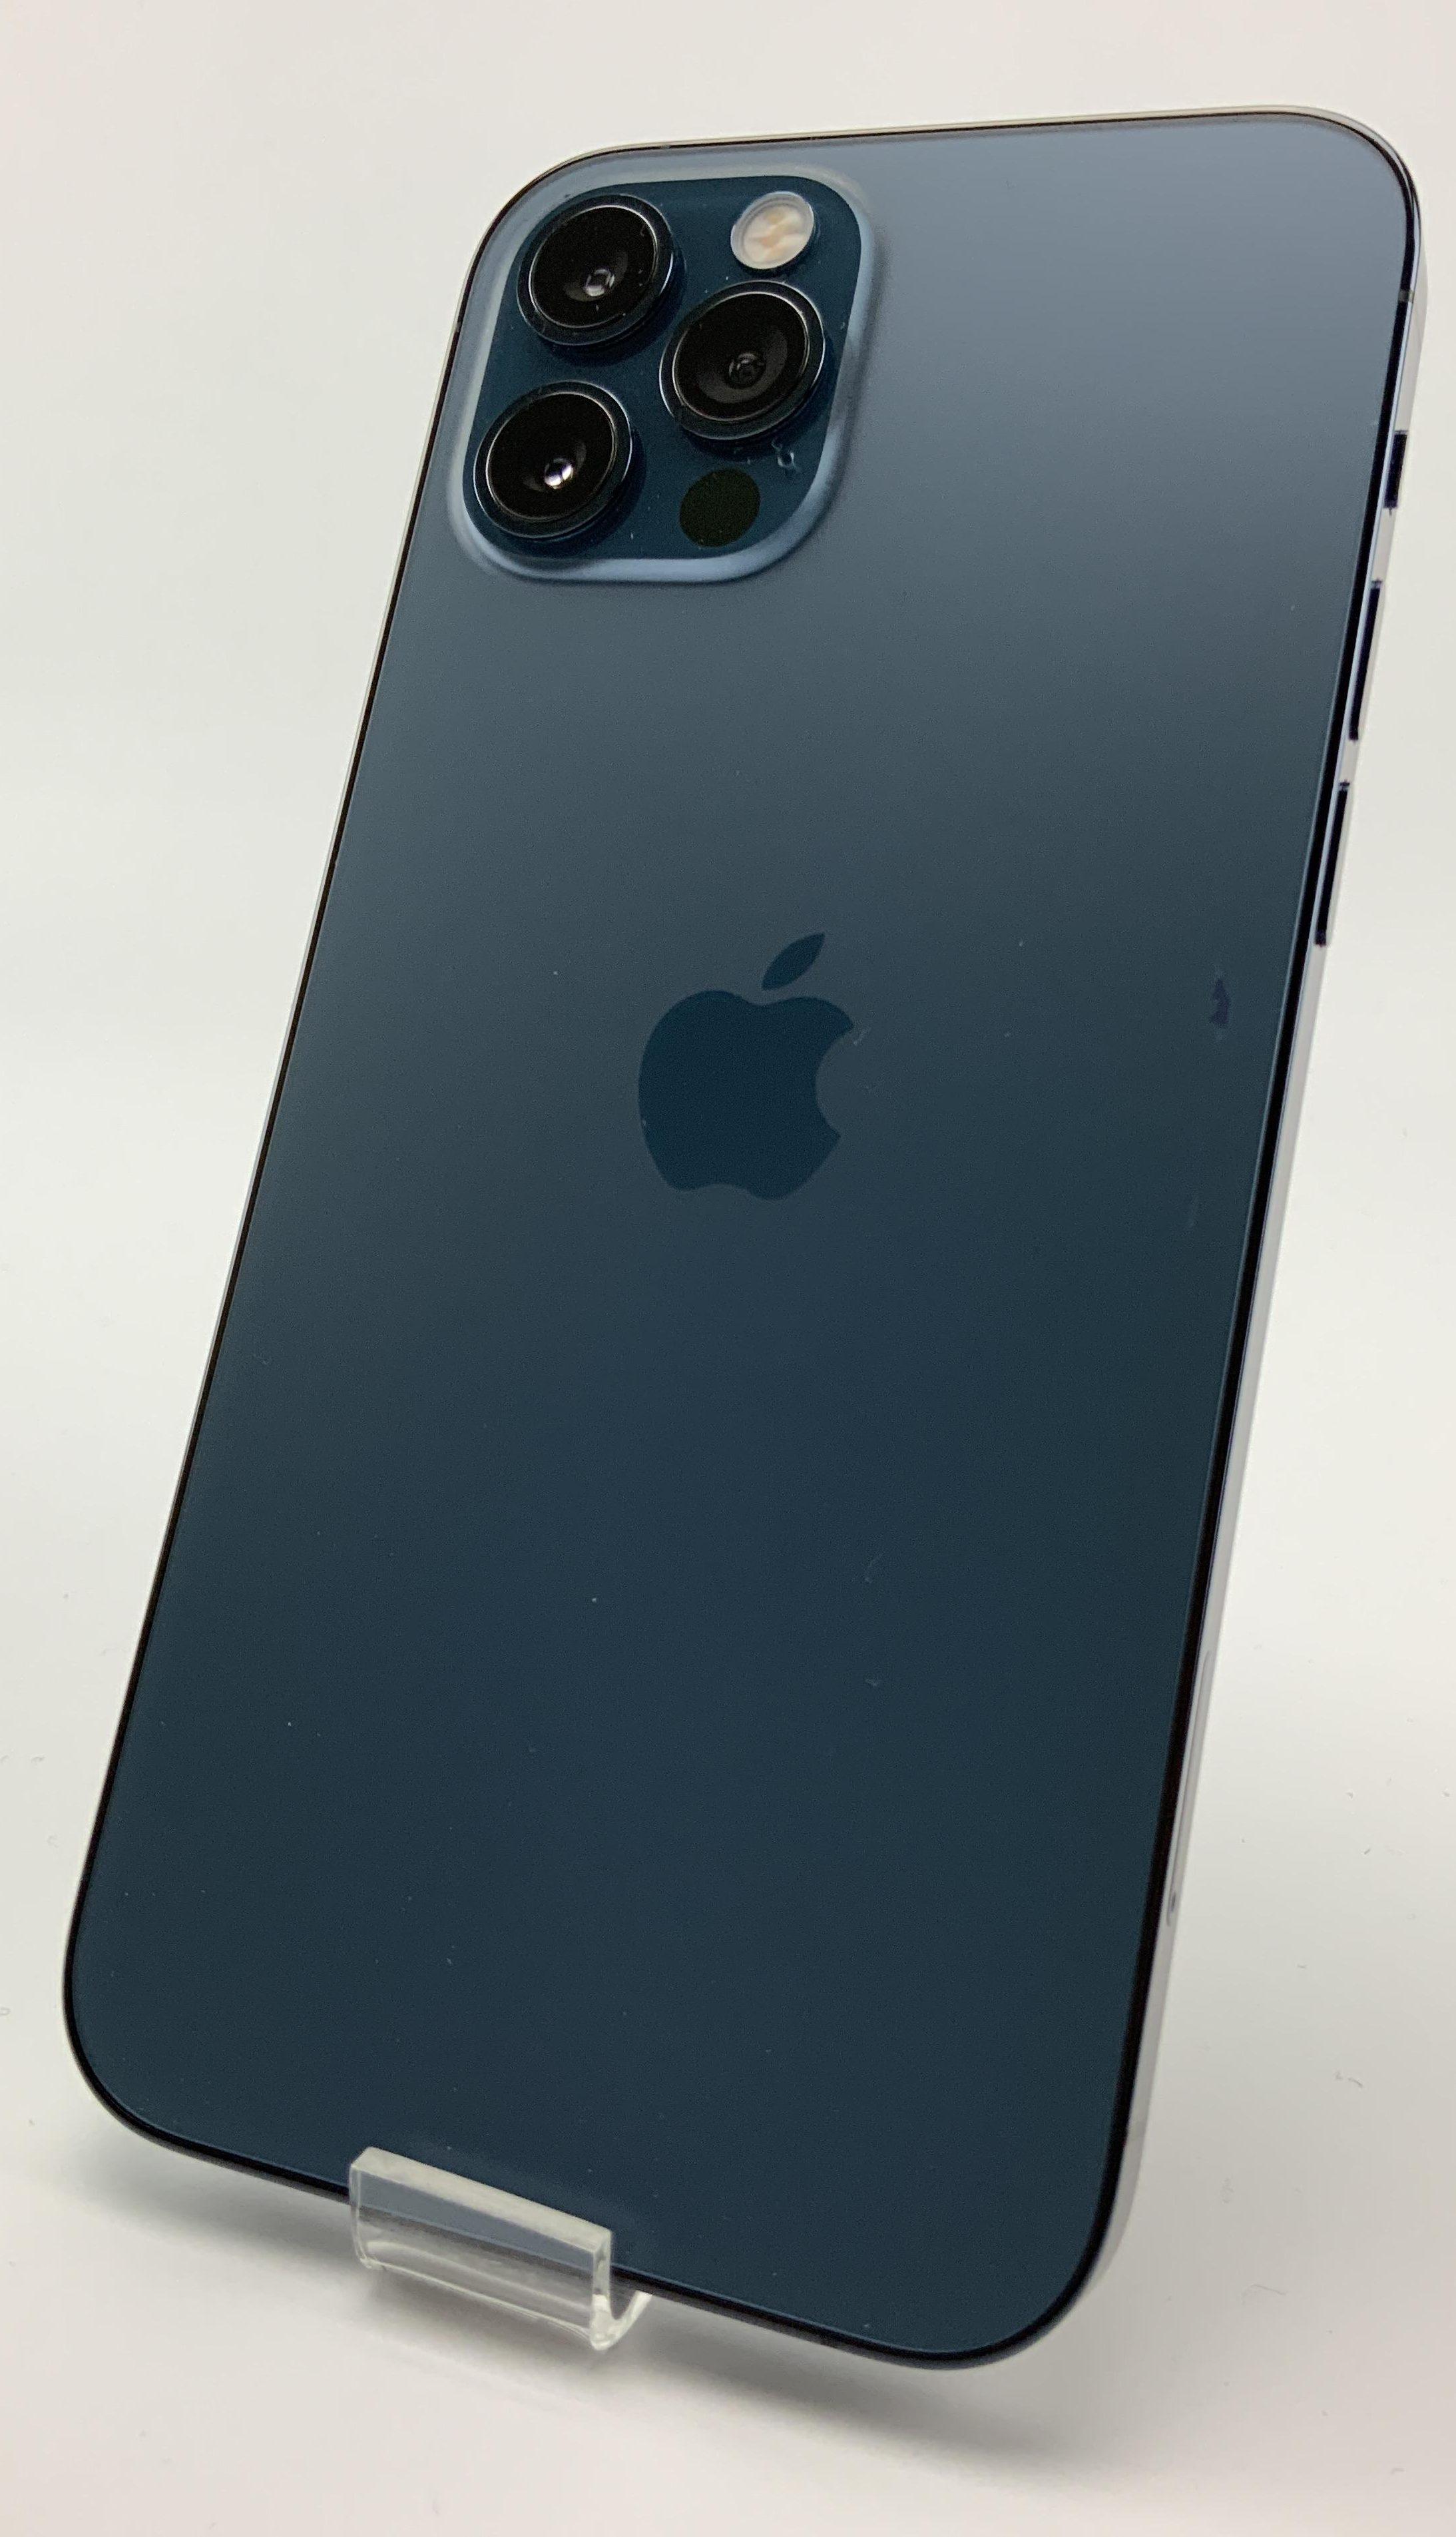 iPhone 12 Pro 128GB, 128GB, Pacific Blue, image 2